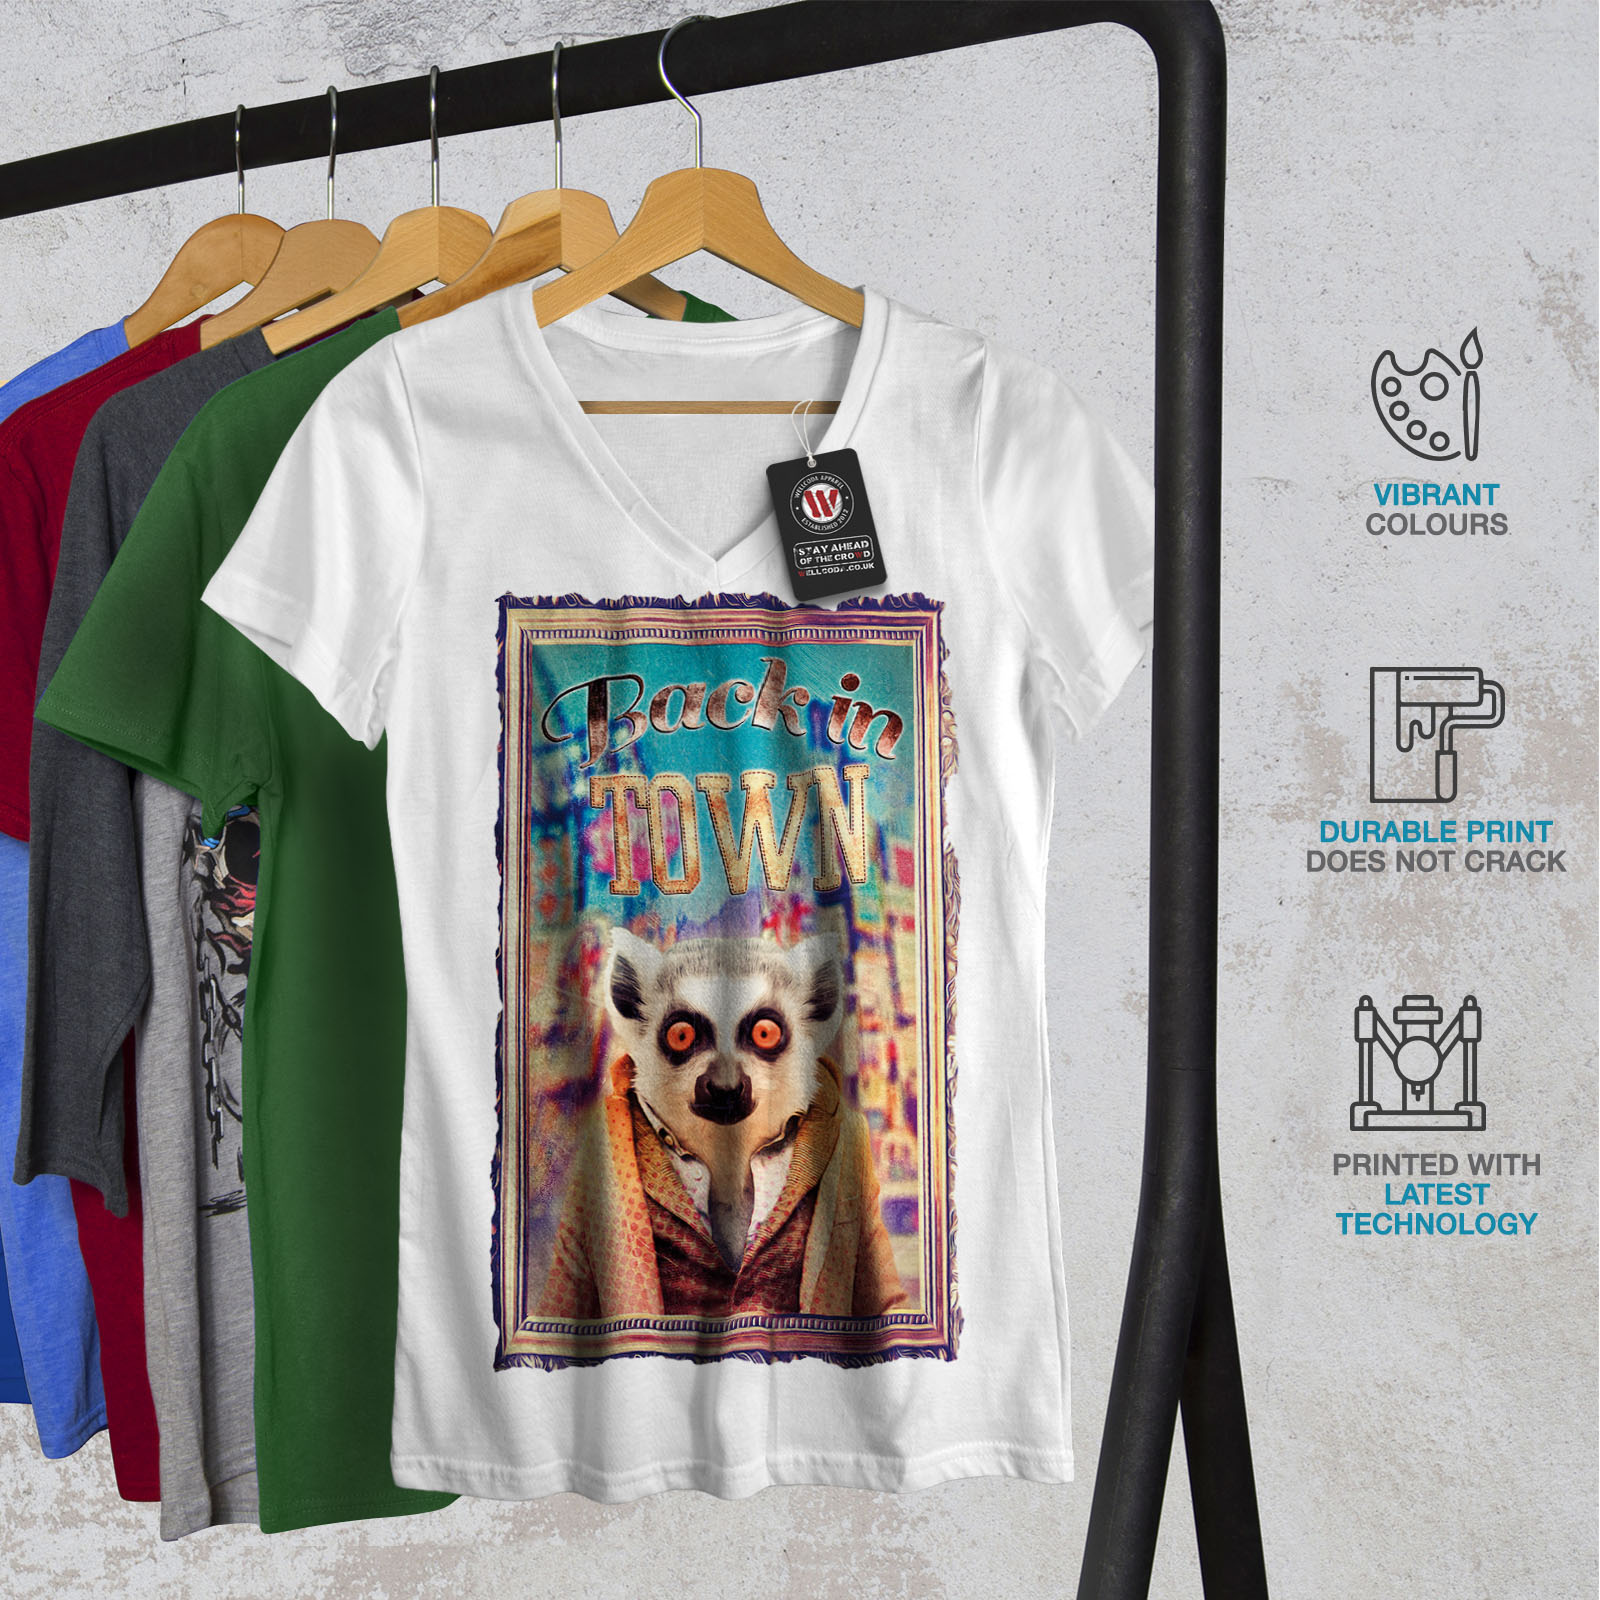 Wellcoda-Back-In-Town-Joke-Womens-V-Neck-T-shirt-Monkey-Graphic-Design-Tee thumbnail 8